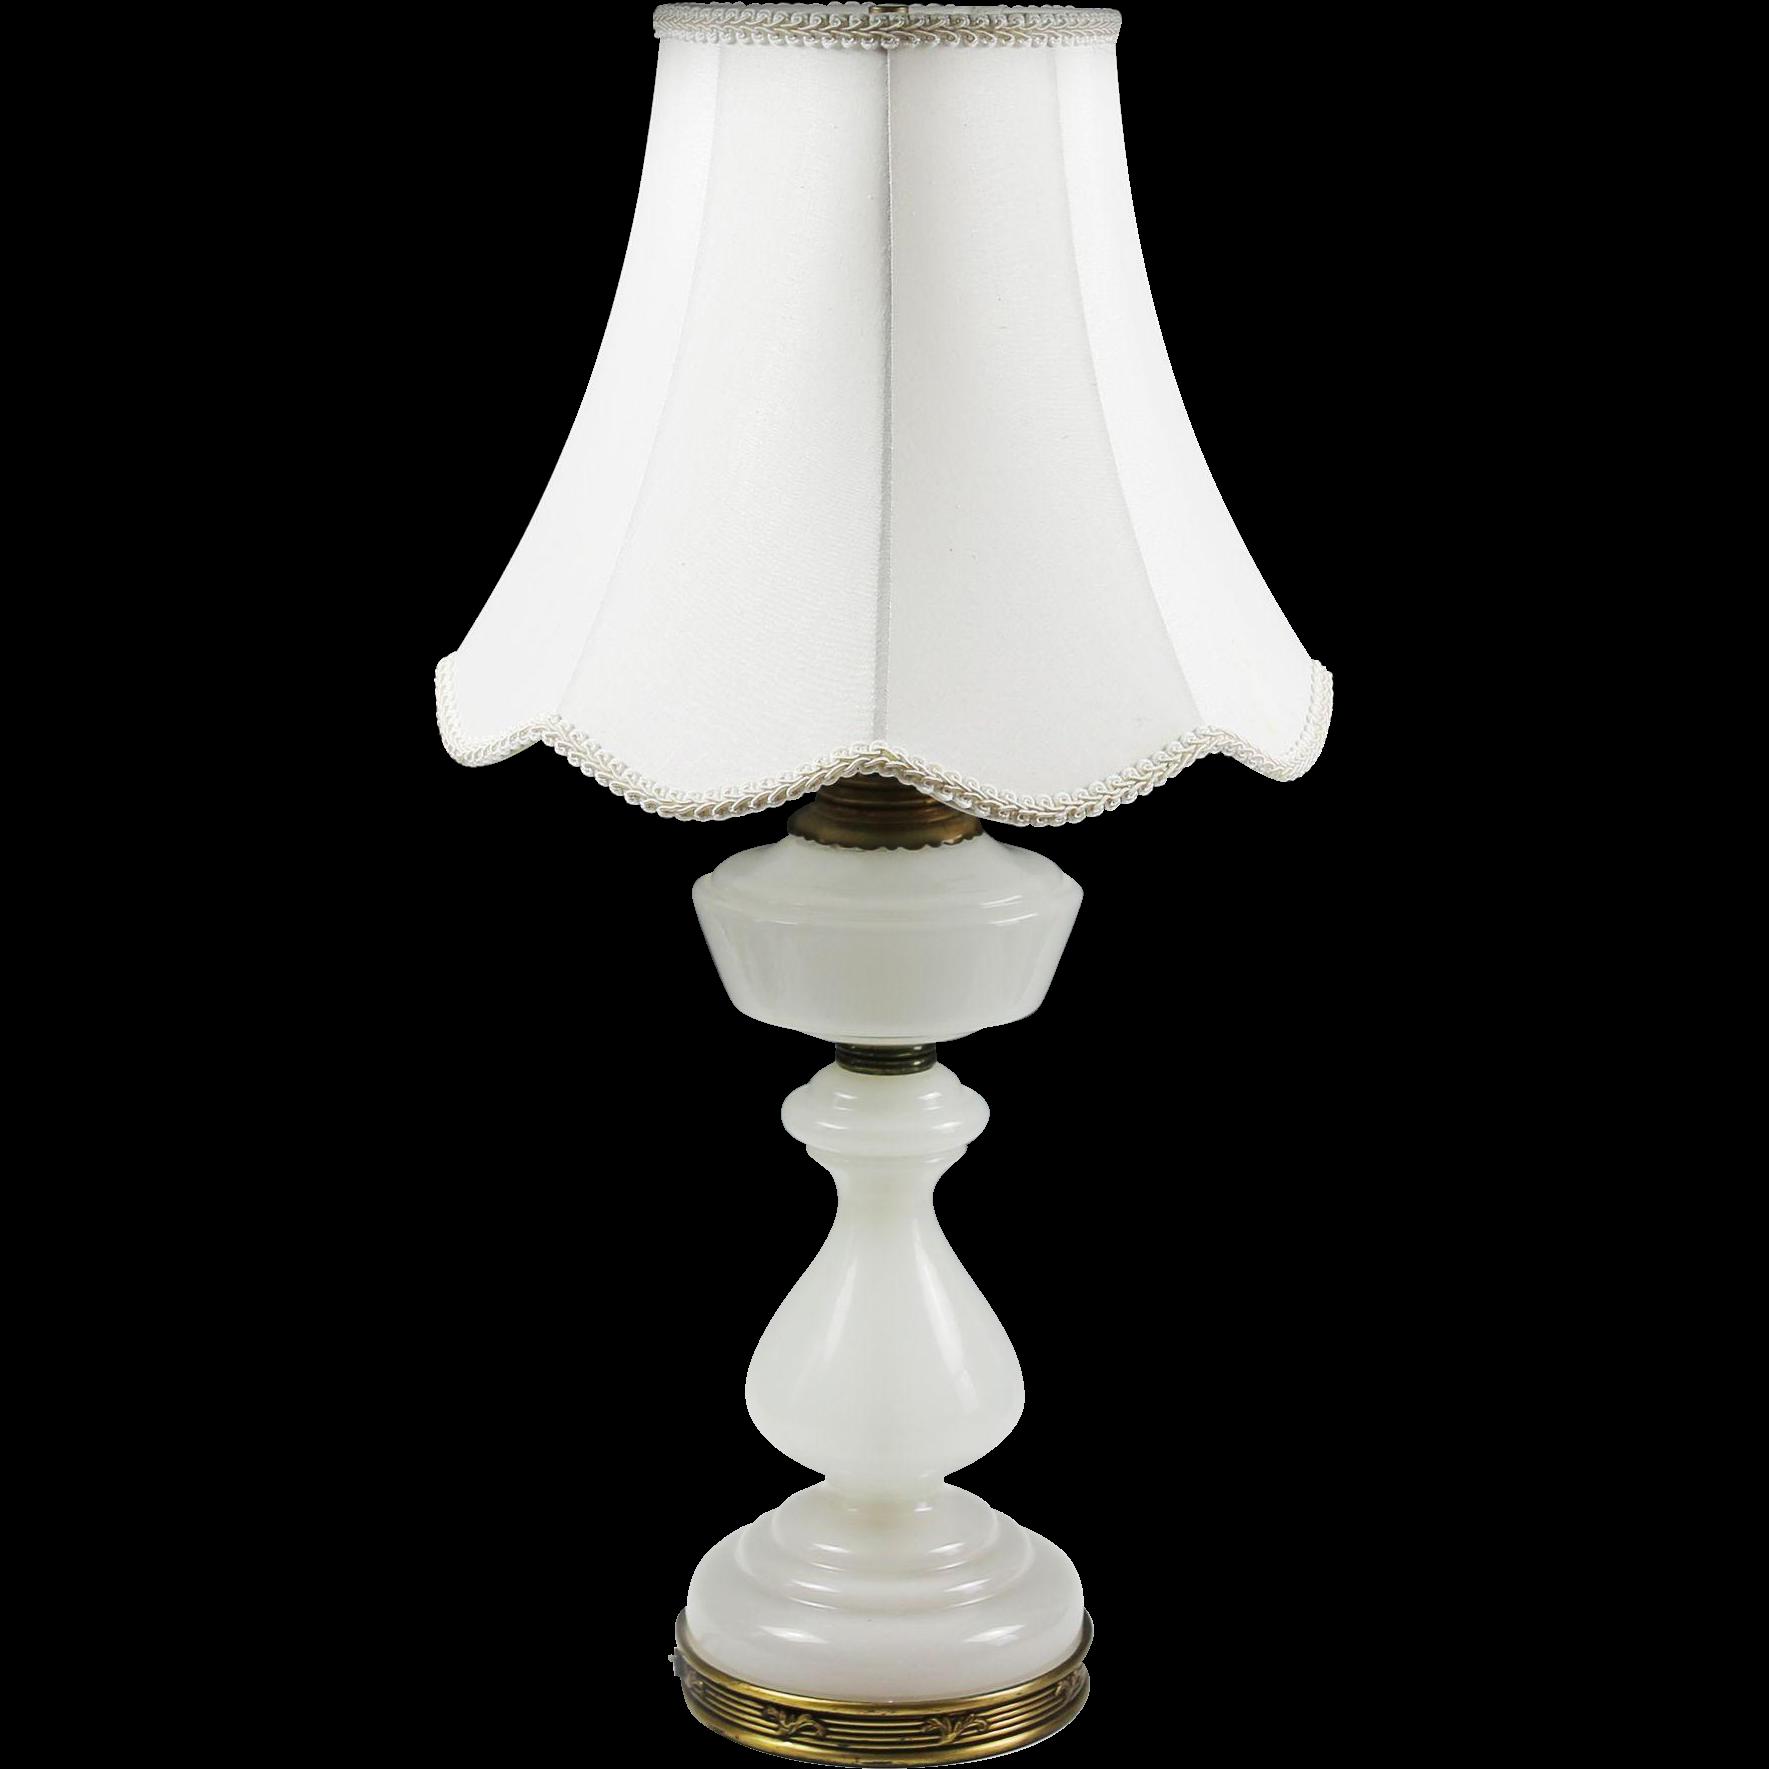 Vintage glass table lamps - Vintage Warren Kessler White Opaline Glass Table Lamp Hollywood Regency